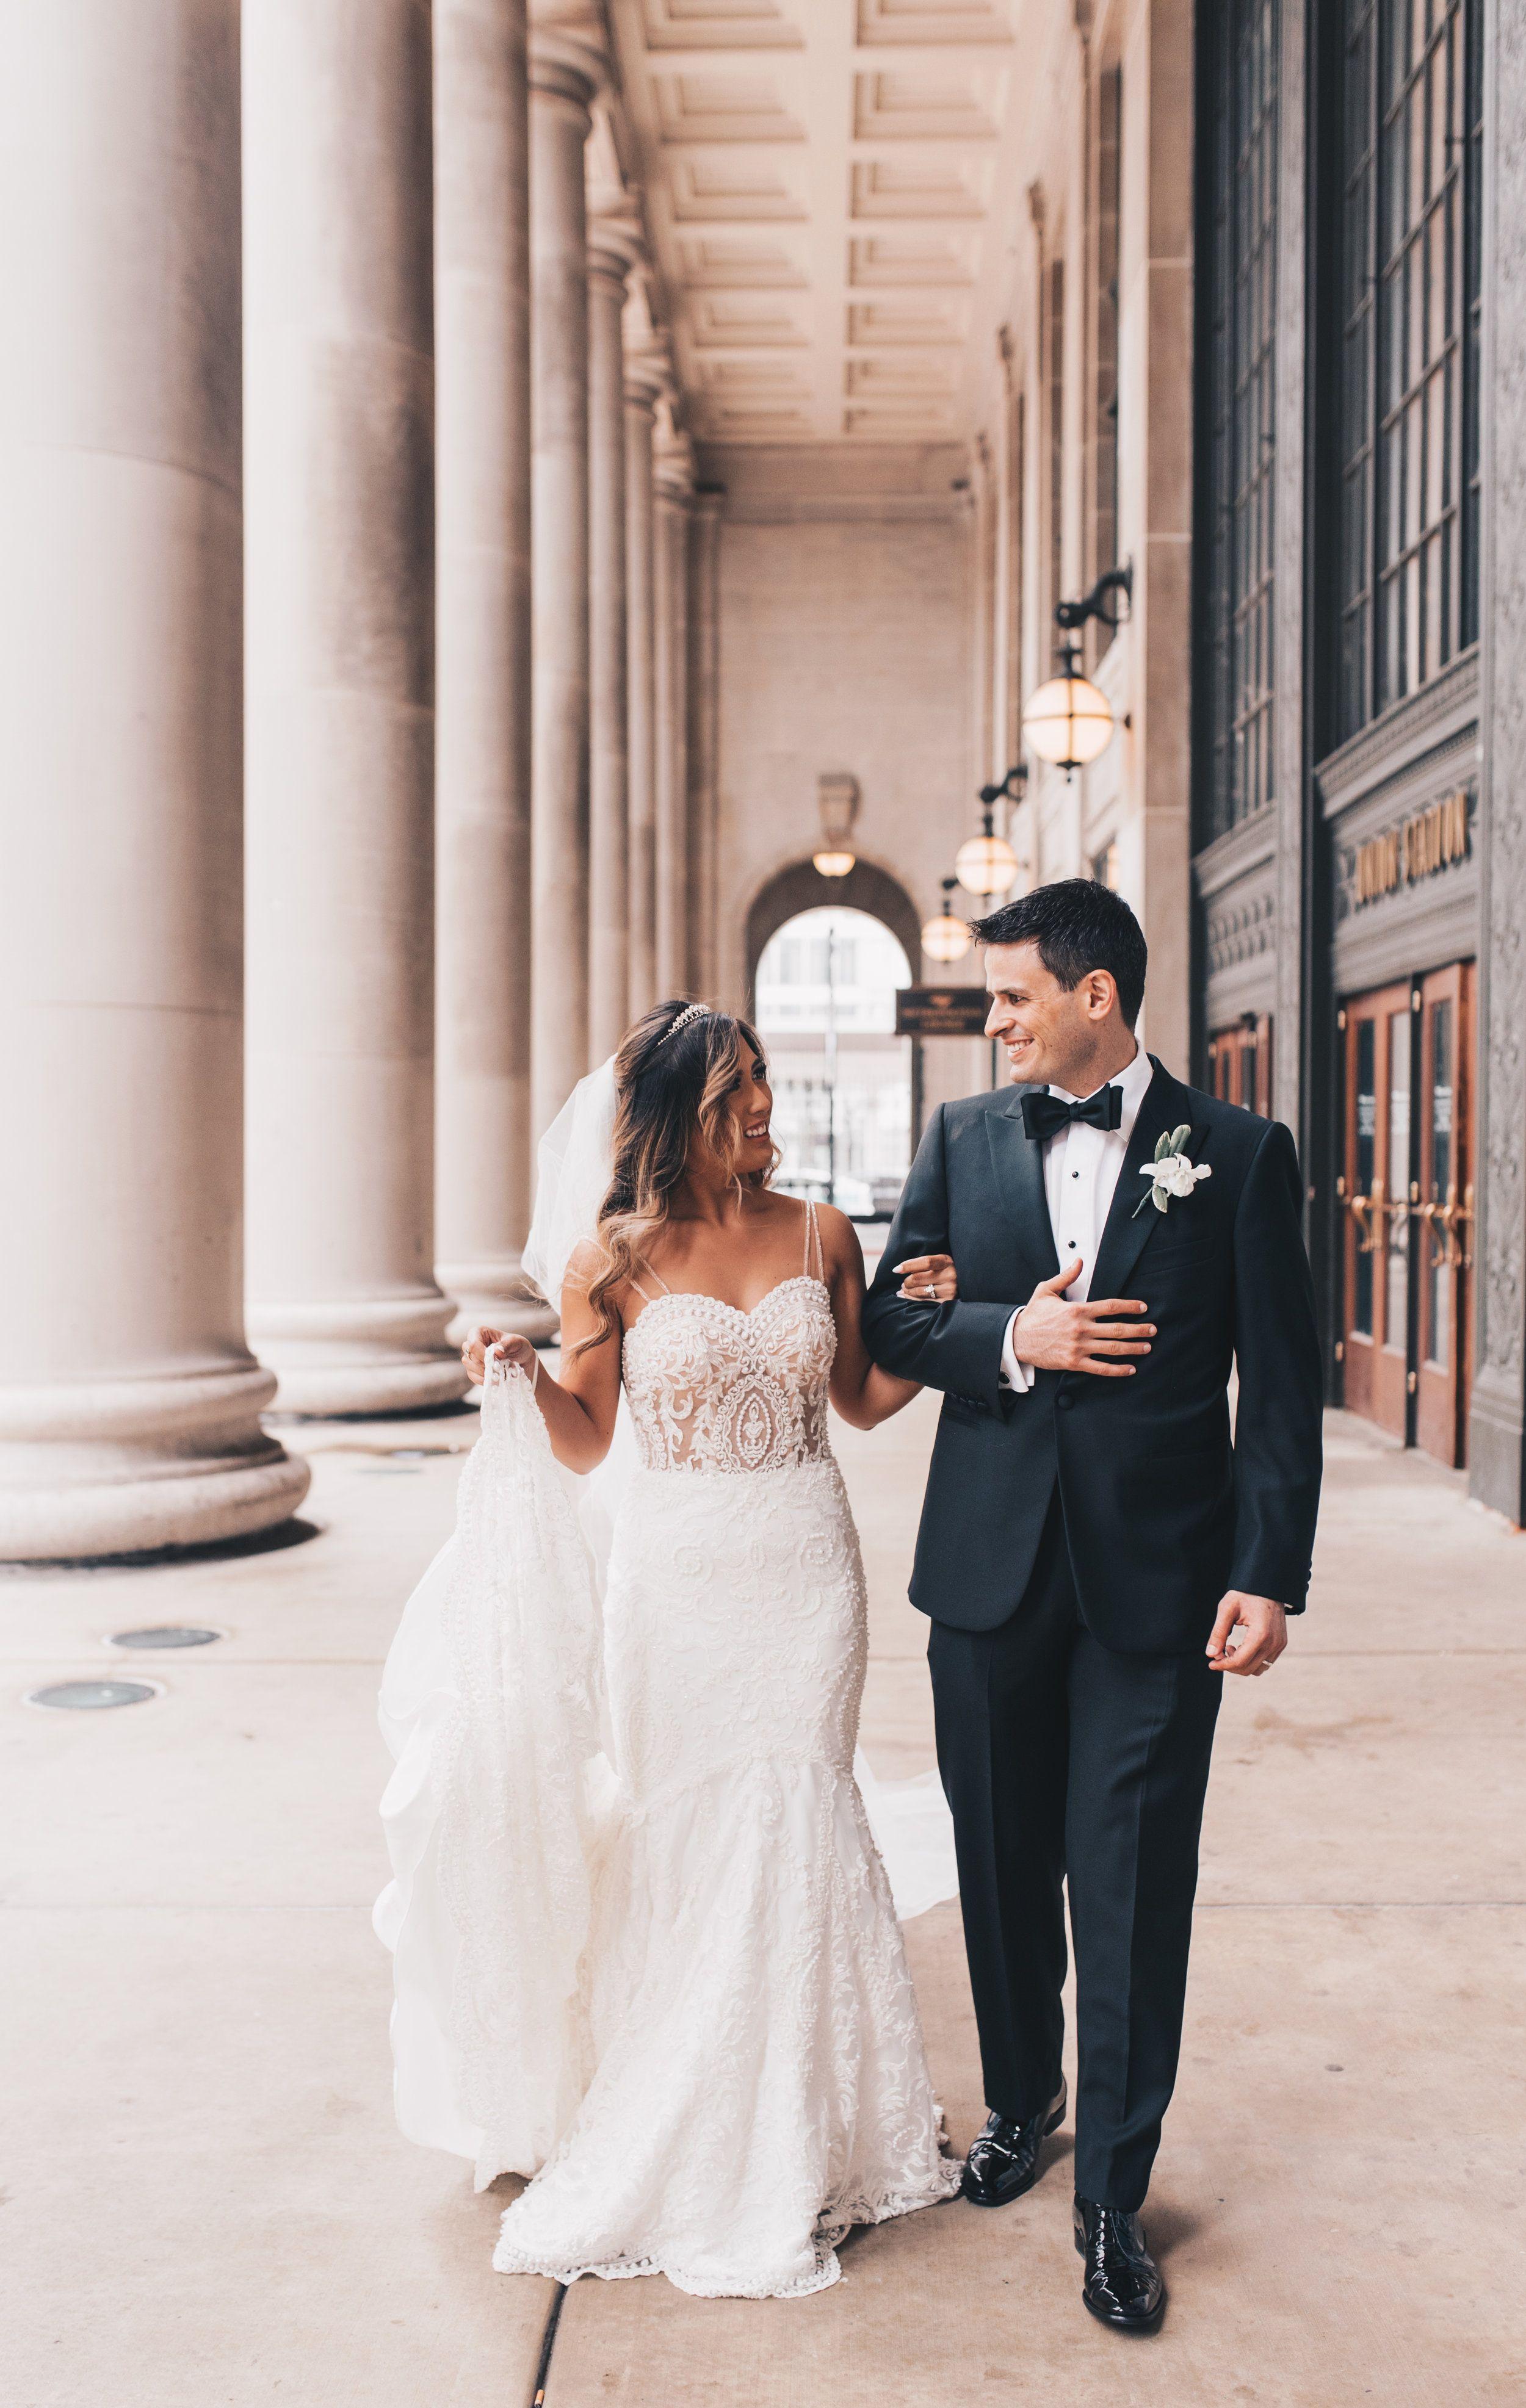 Chicago Bride And Groom Photos Chicago Wedding Chicago Wedding Photographer Chicago Elopement Photographer C In 2020 Chicago Wedding Wedding Bride And Groom Photos